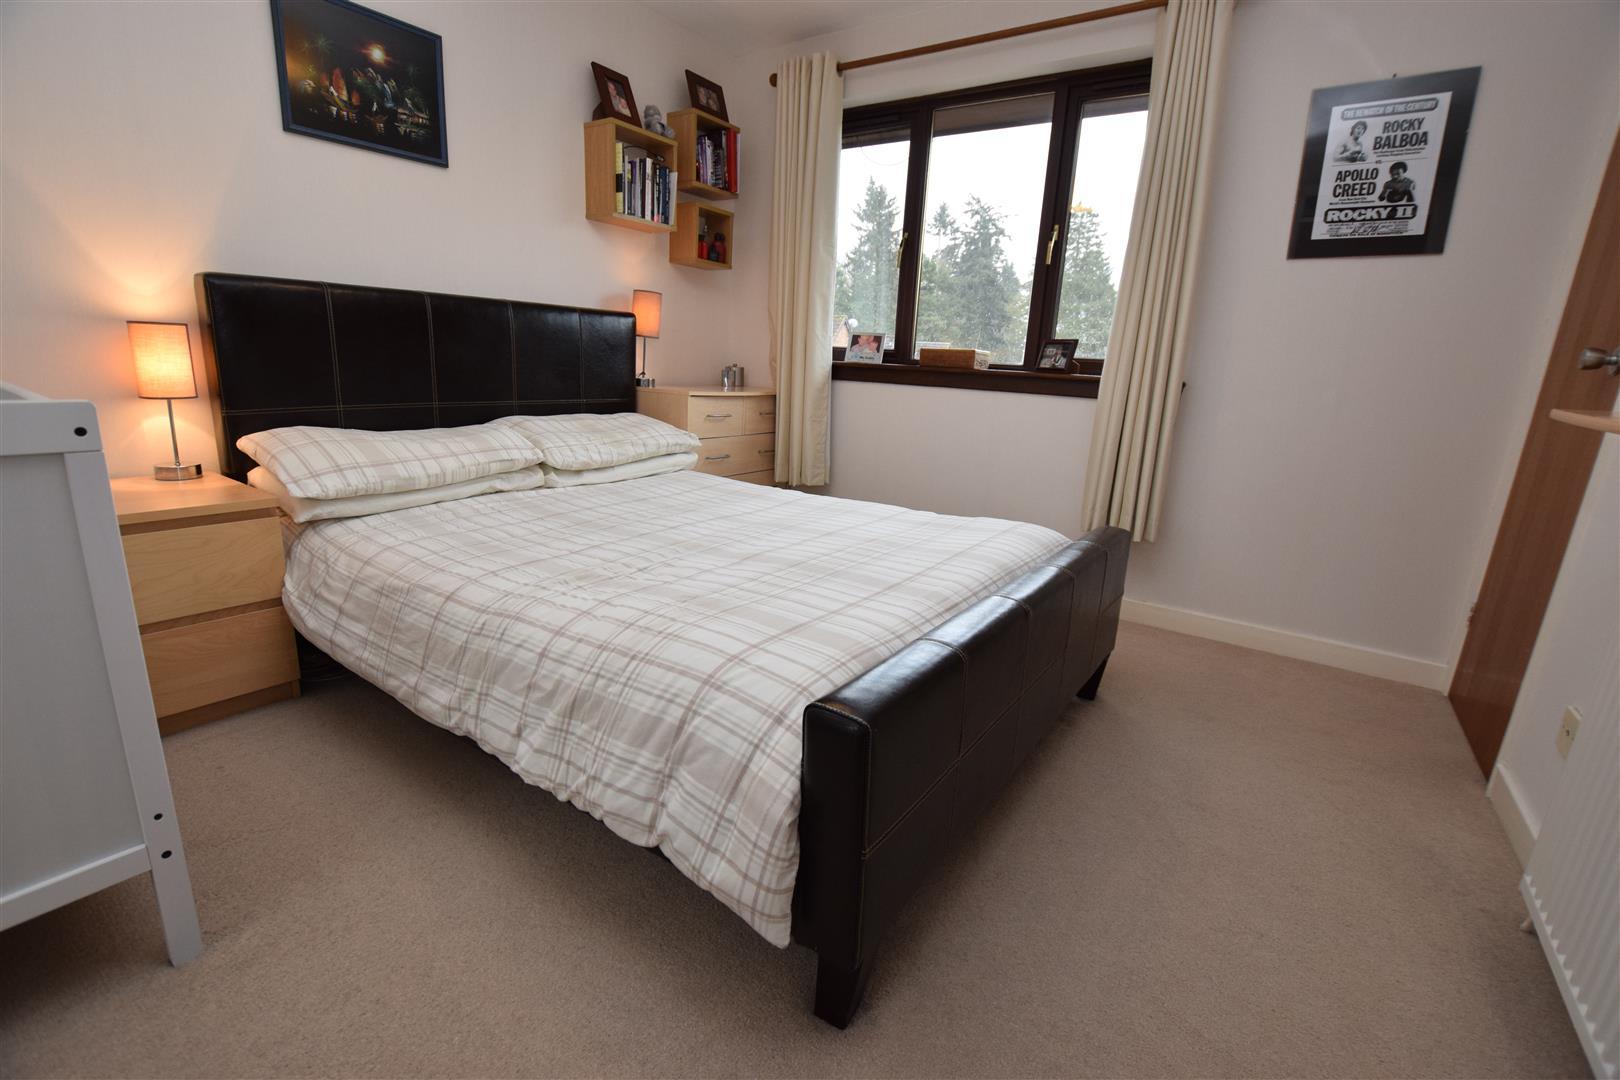 6, Marshall Gardens, Luncarty, Luncarty Perth, Perthshire, PH1 3YX, UK